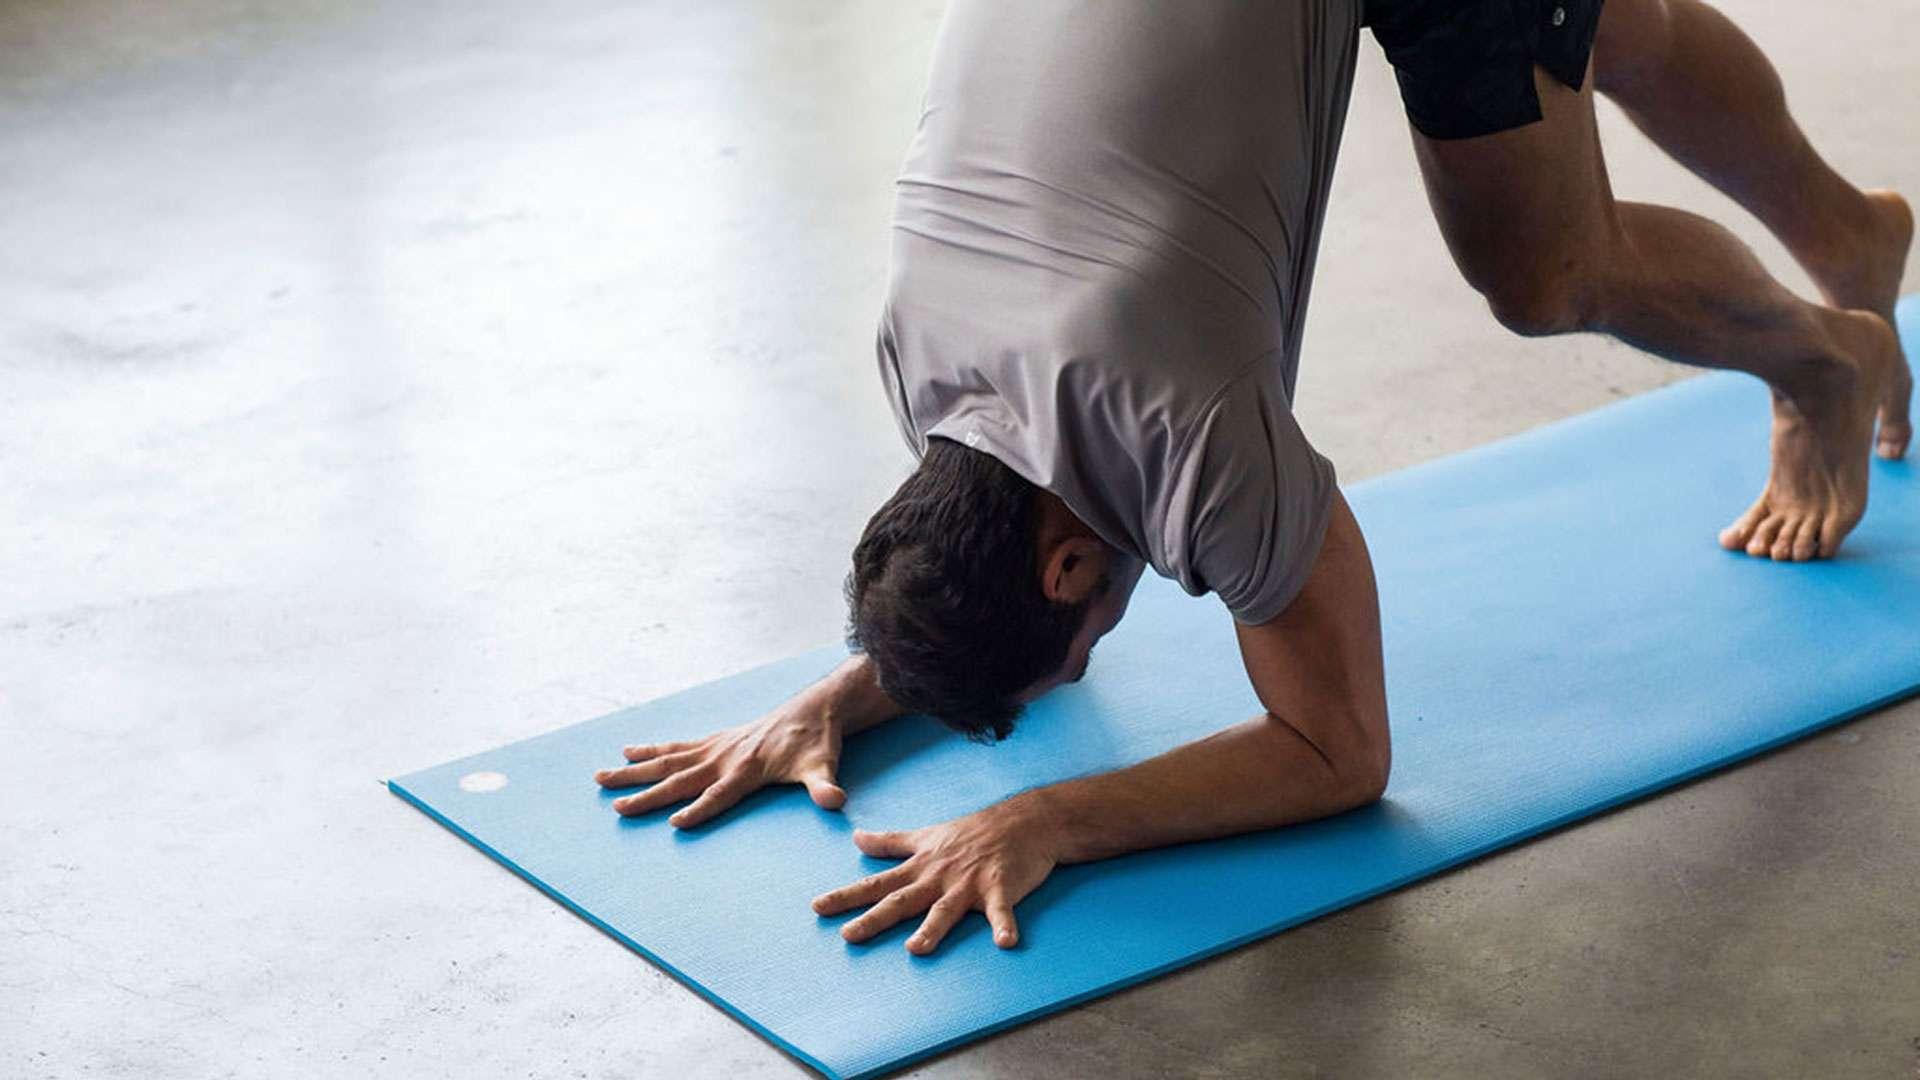 manduka non slip sticky yoga mat high quality